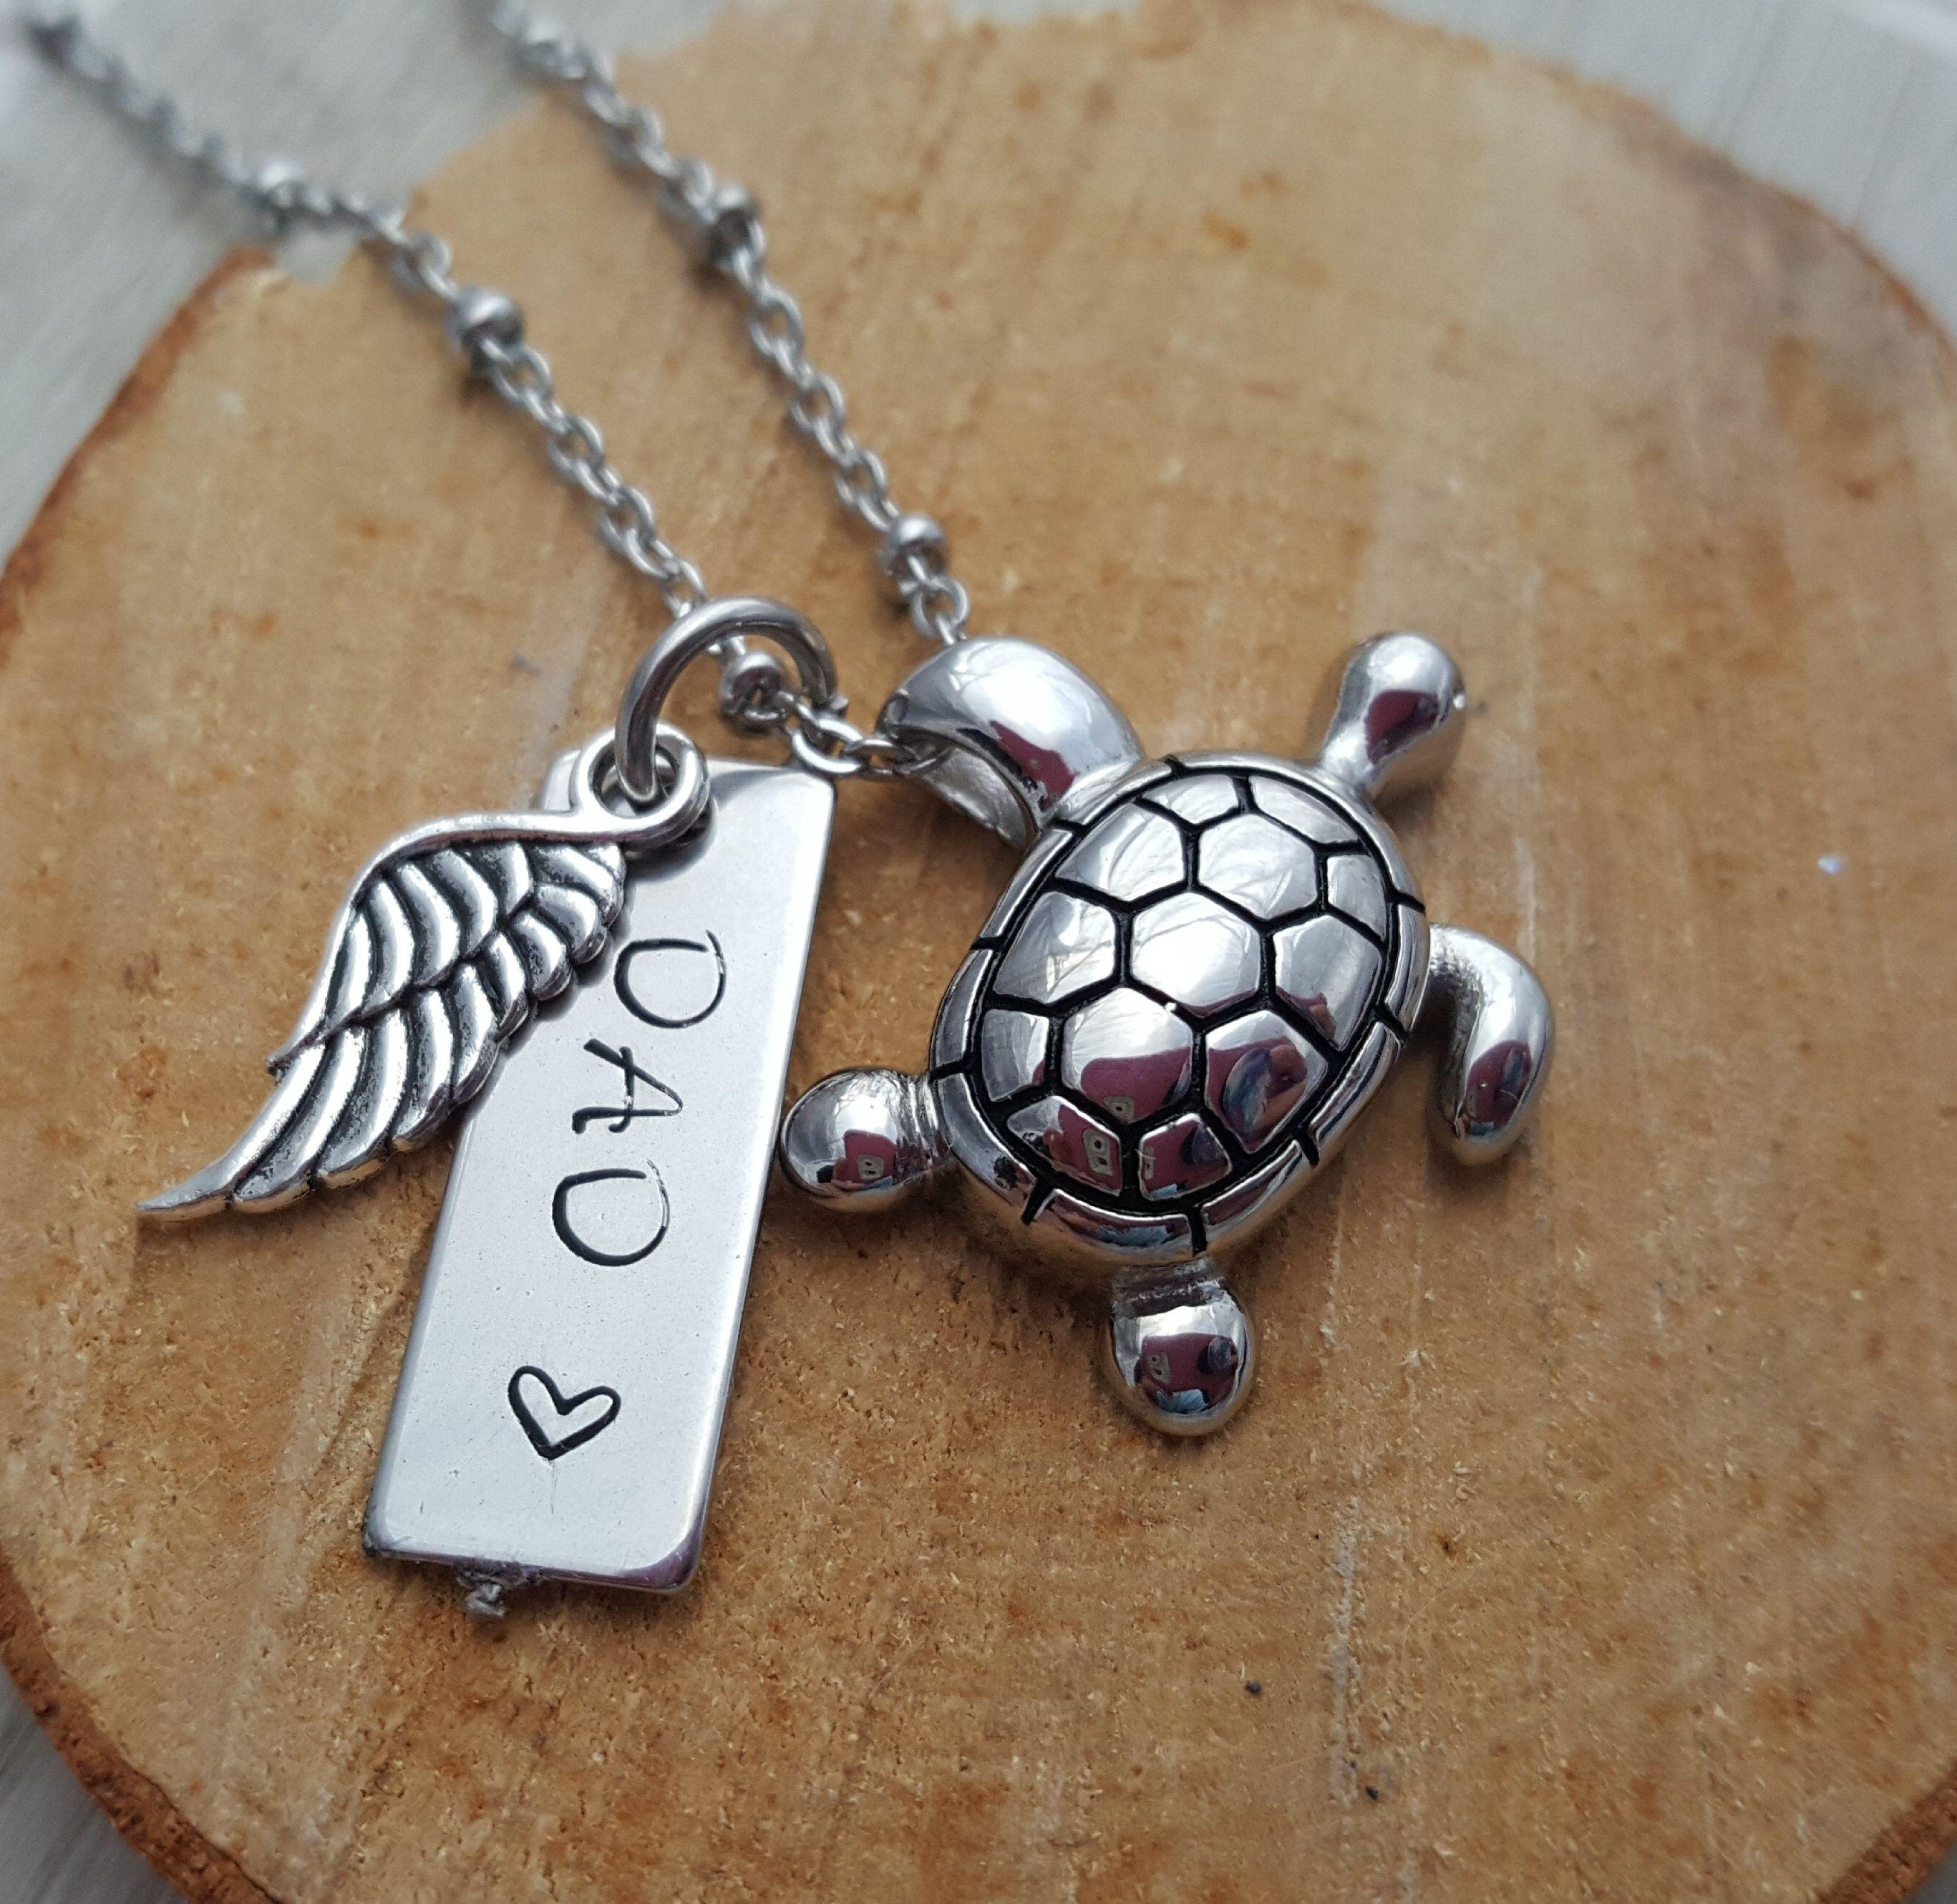 0b7450c307eb8 Sea Turtle Cremation Jewelry, Personalized Jewelry, Urn Necklace ...